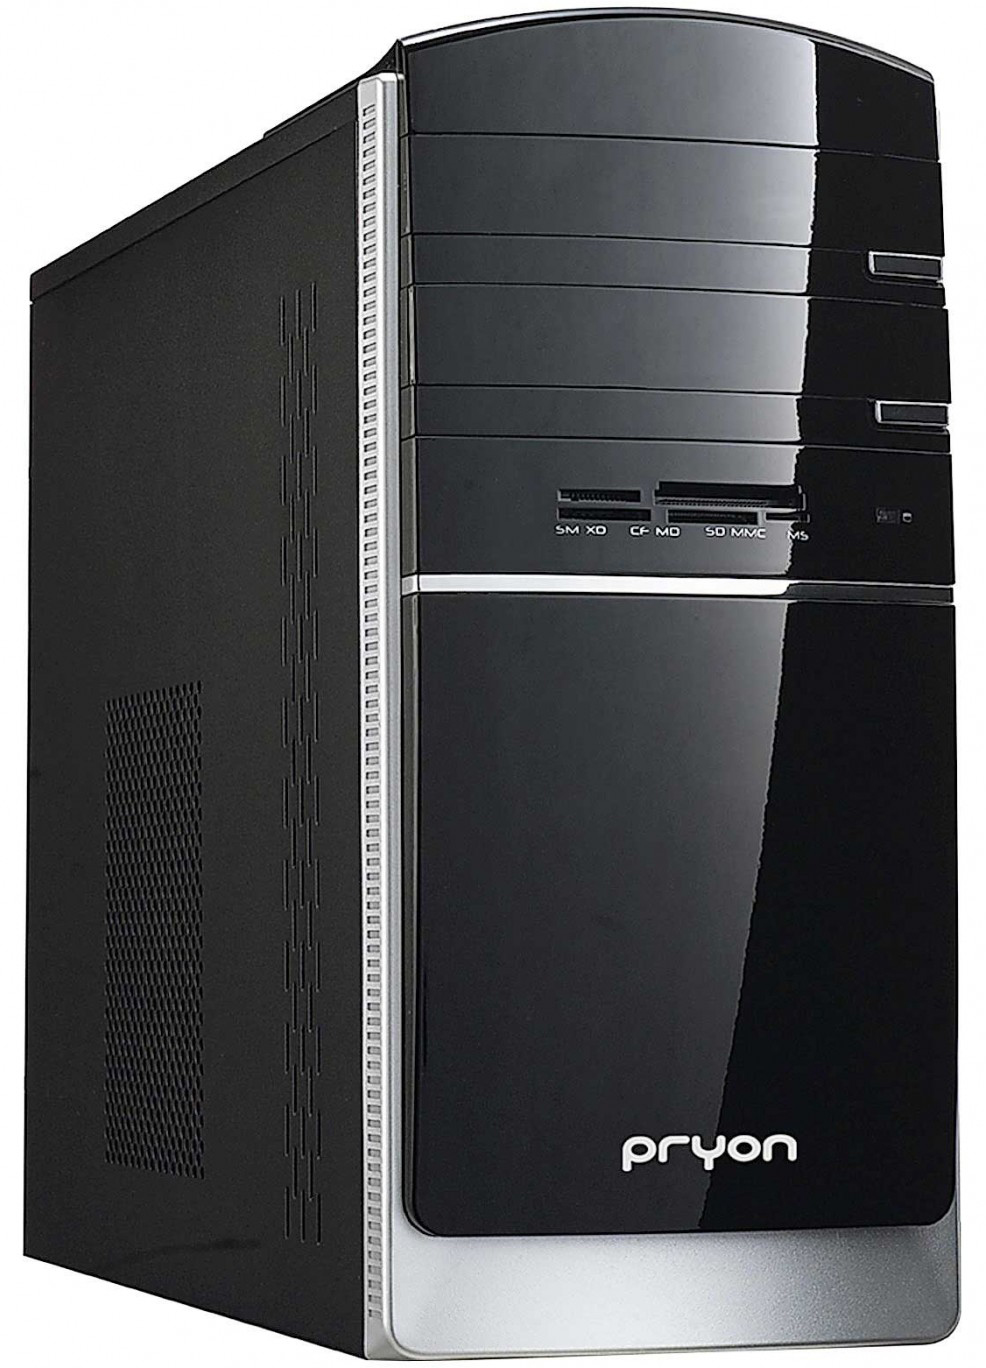 Pryon Pry Fx6d Pry Fx6e Reviews Productreview Com Au